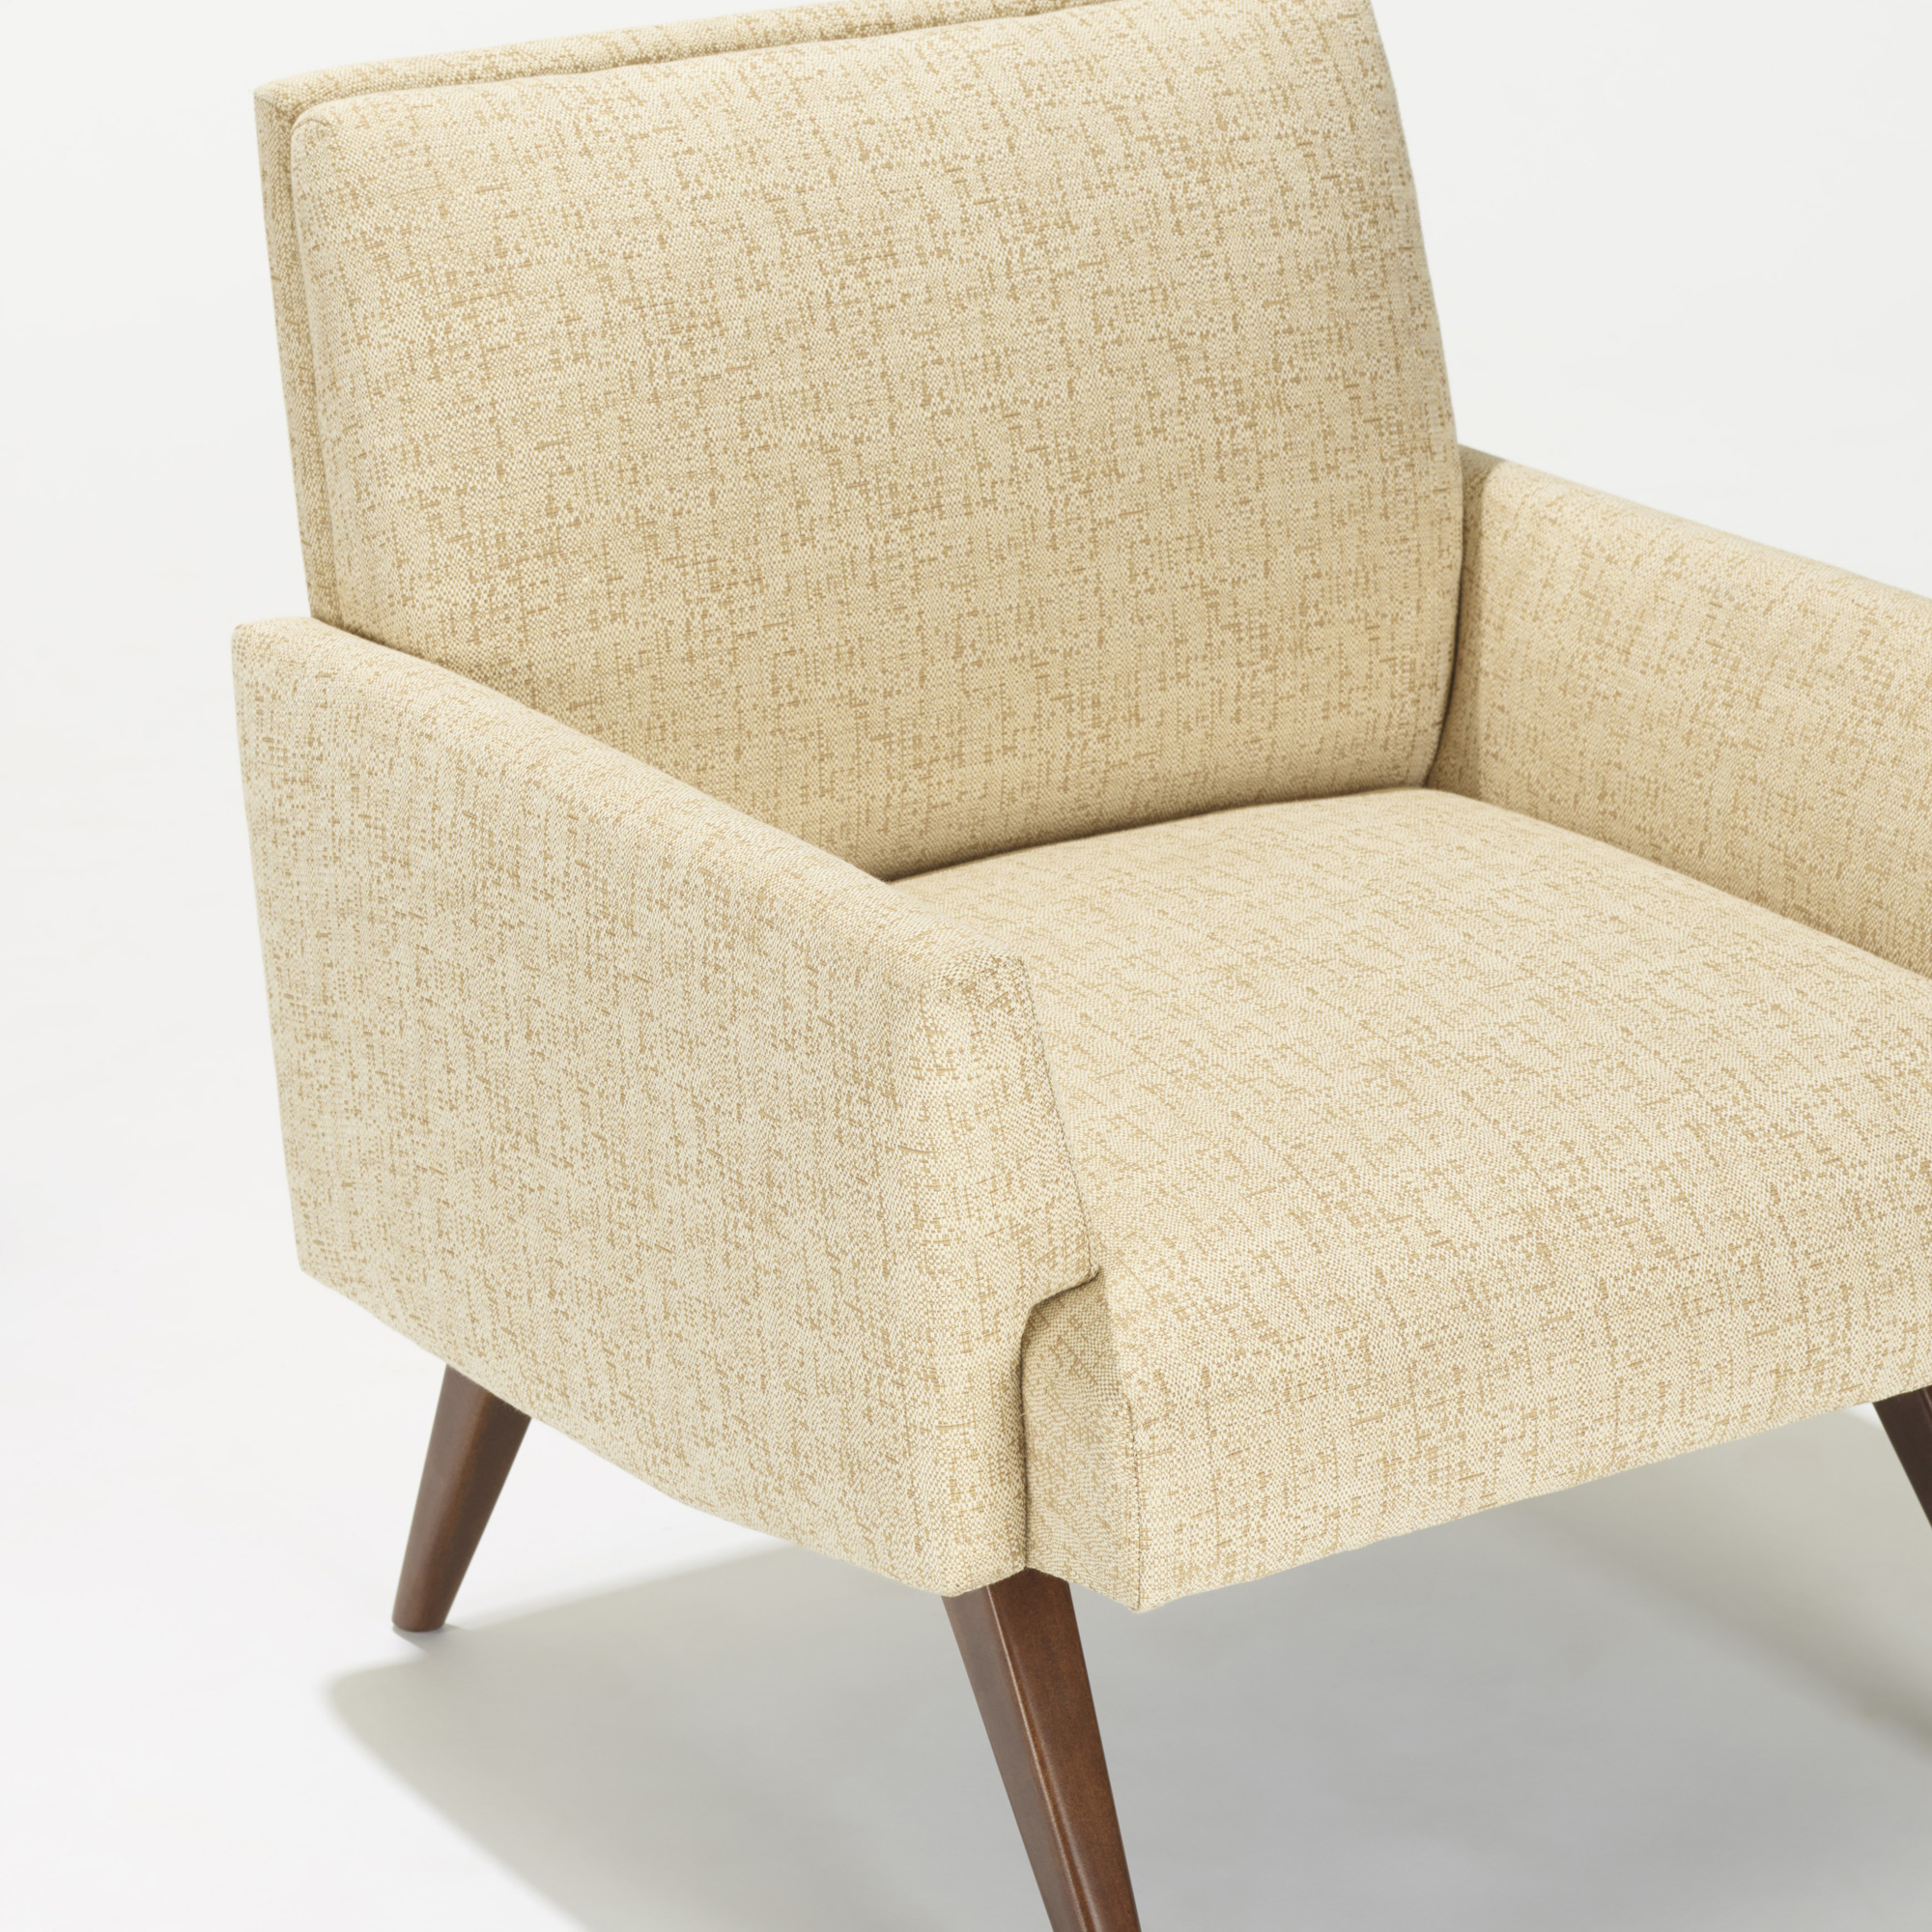 248 Paul Mccobb Planner Group Lounge Chairs Model 102b